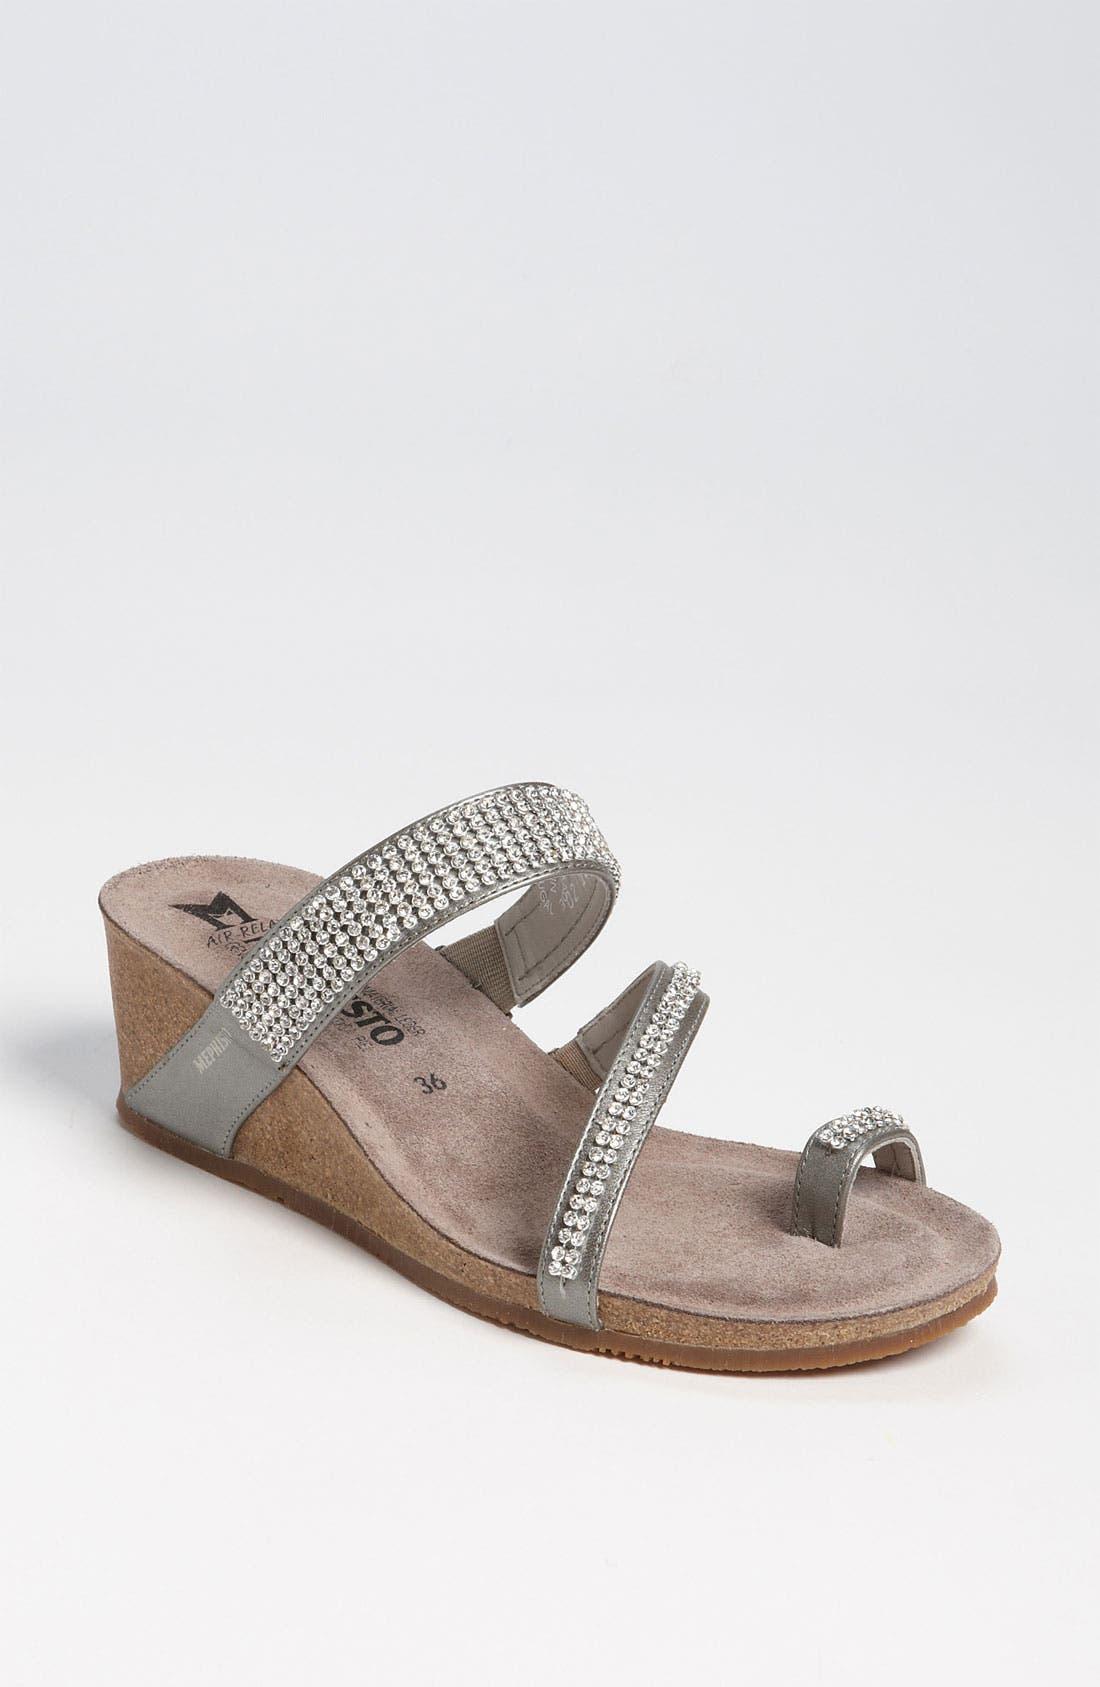 Alternate Image 1 Selected - Mephisto 'Milly' Sandal